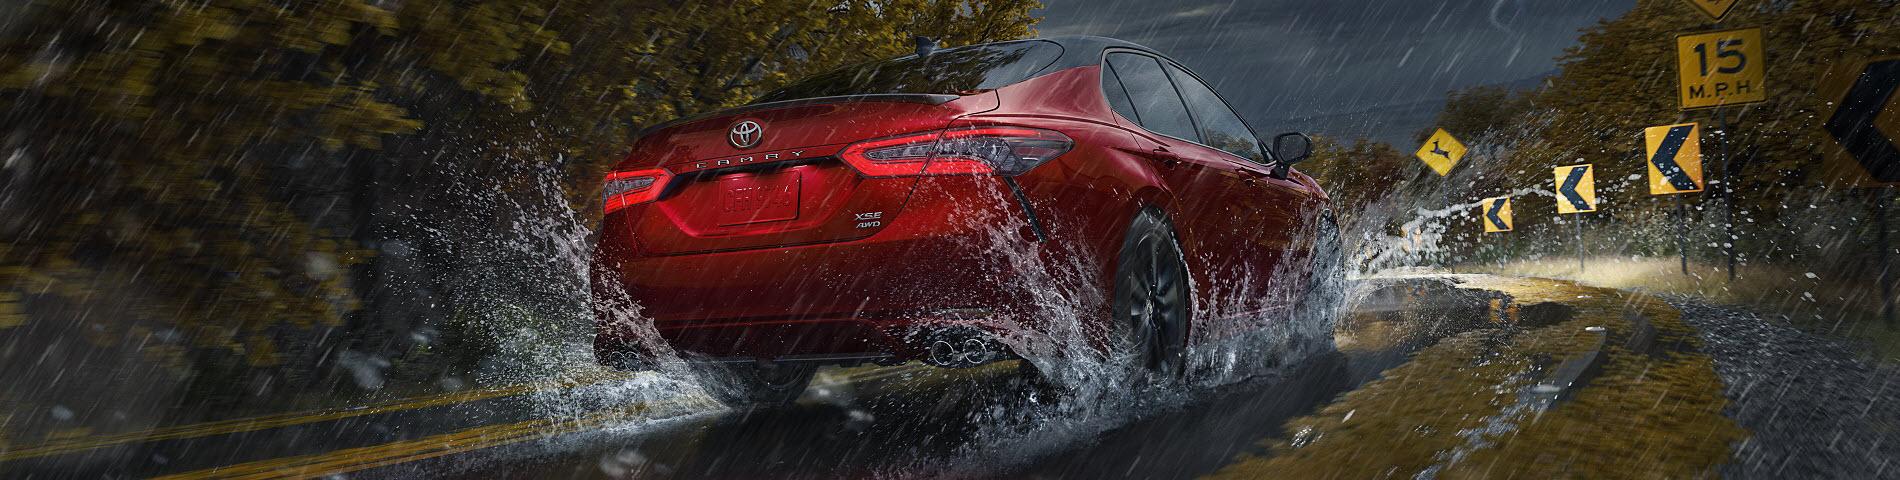 2021 Toyota Camry Engine Specs